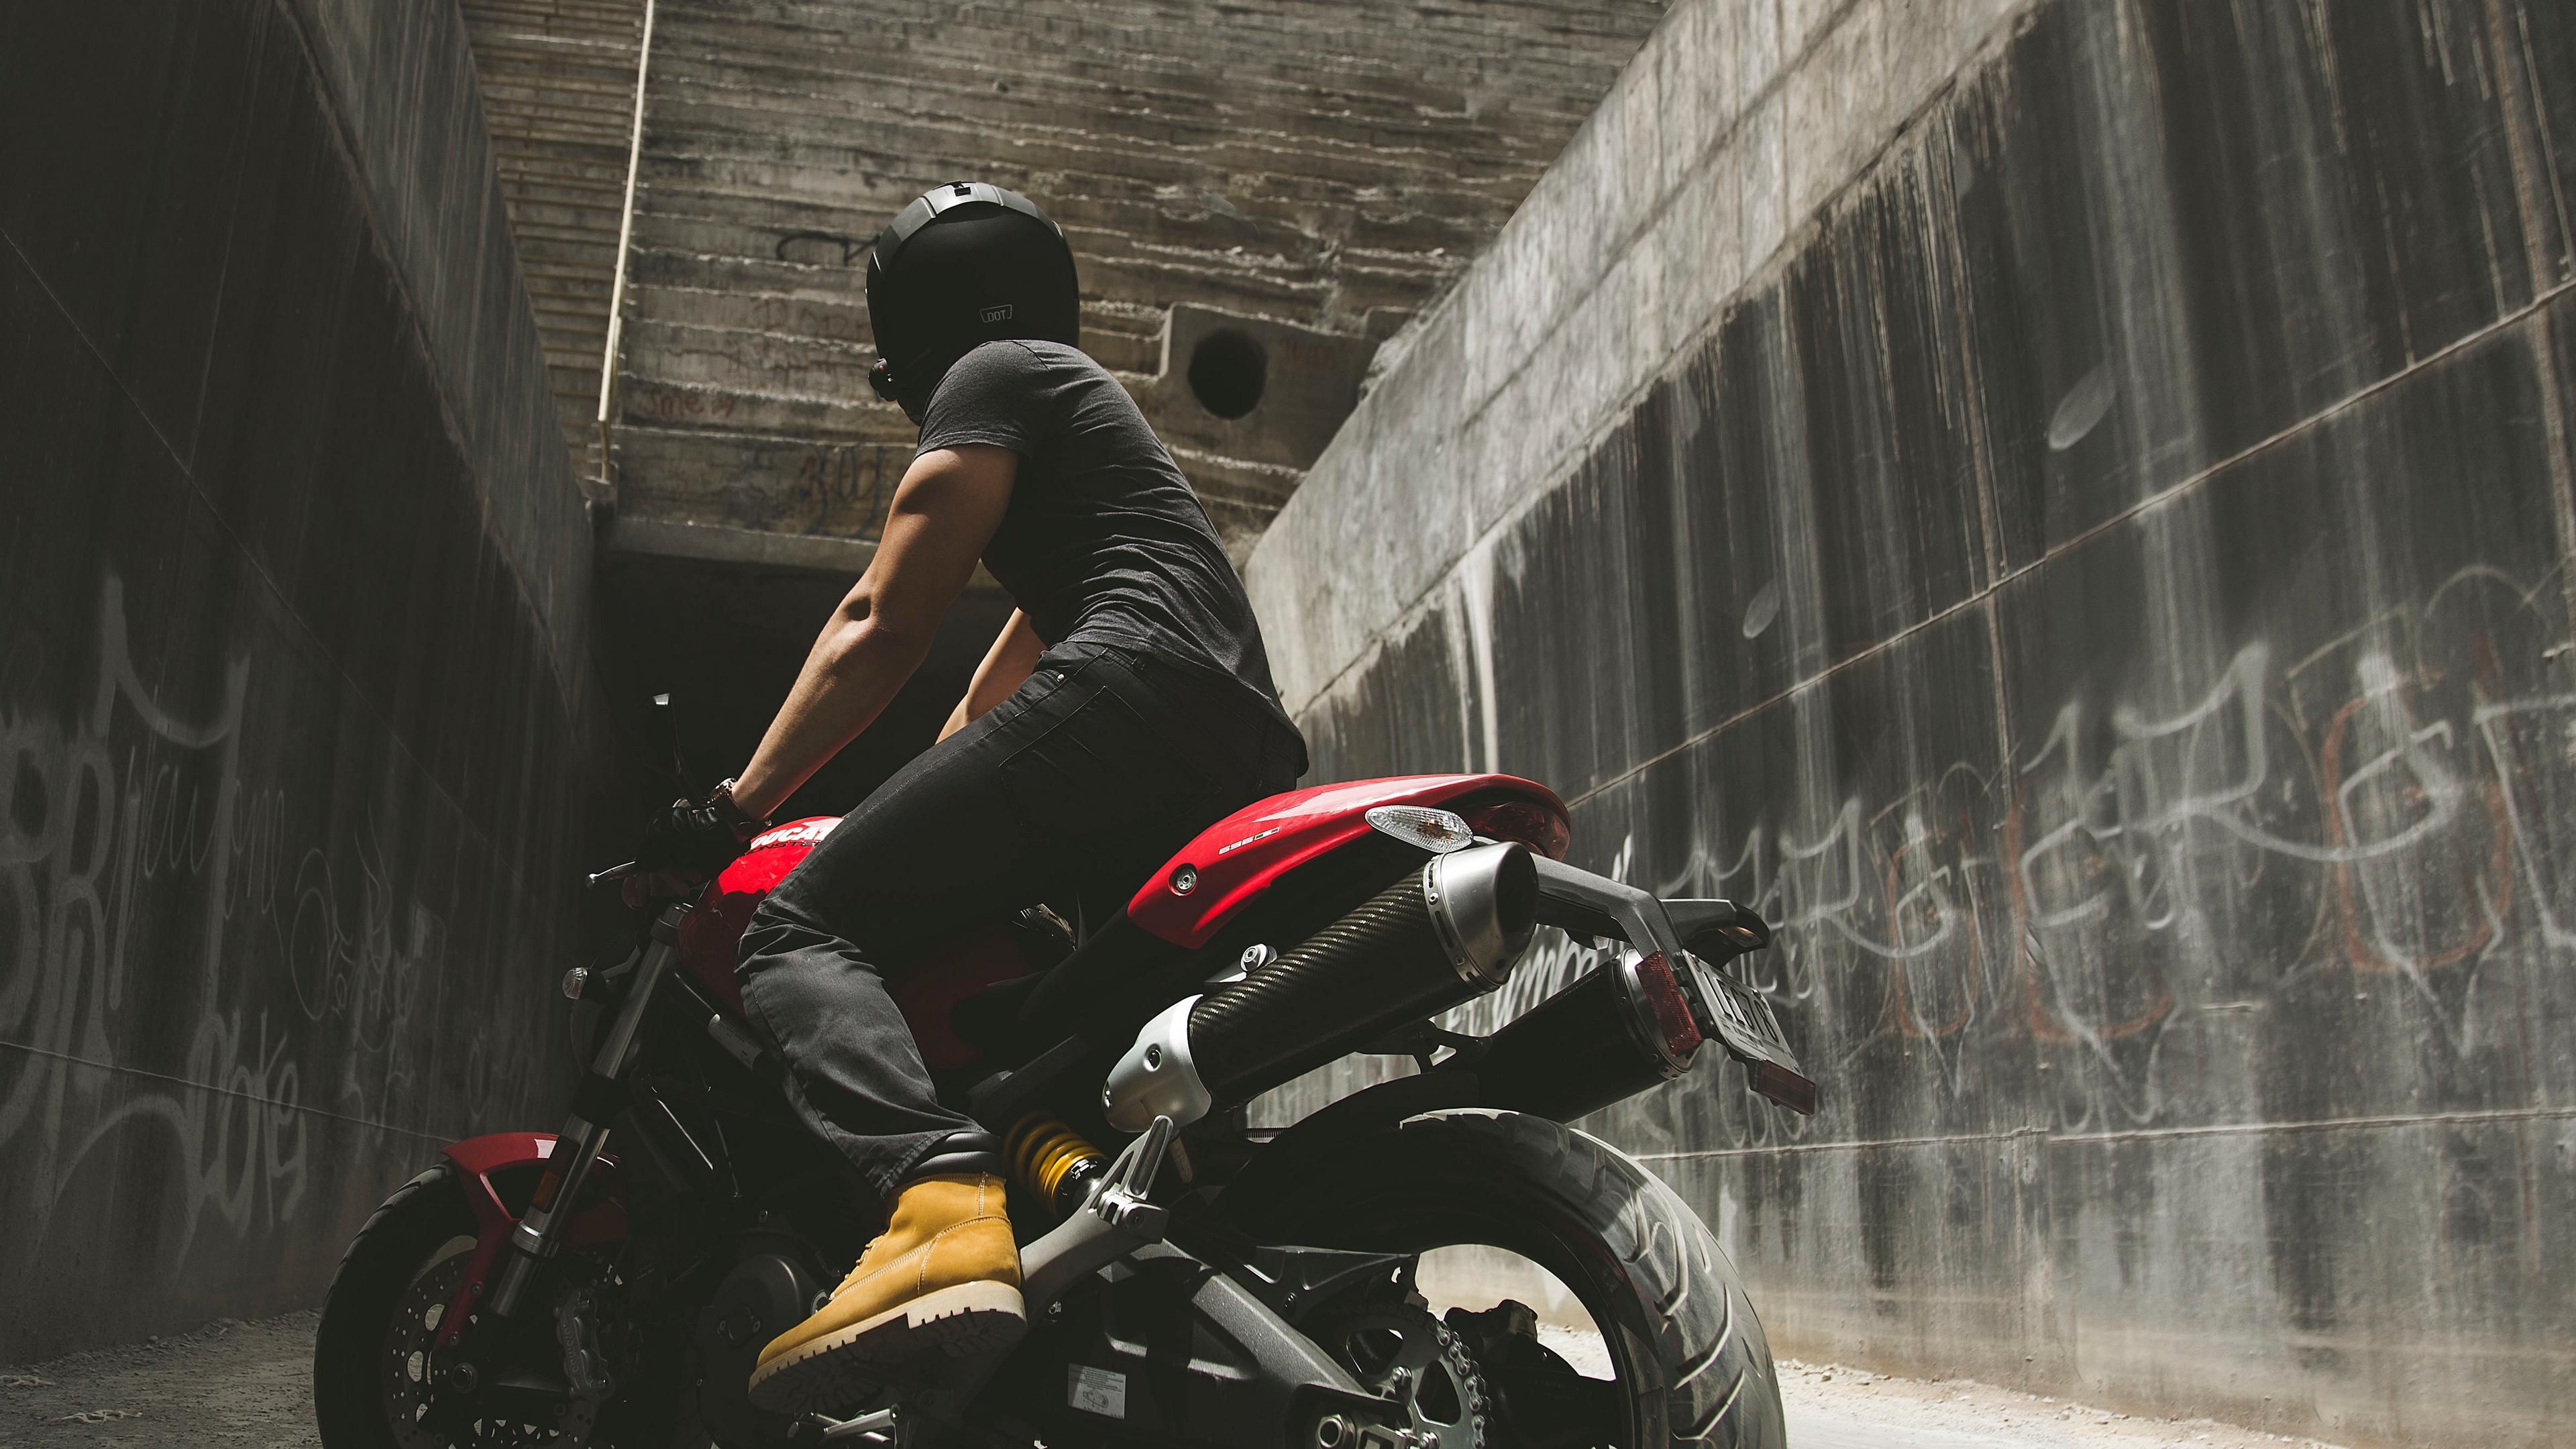 motorcyclist motorcycle helmet wall concrete 4k 1536018393 - motorcyclist, motorcycle, helmet, wall, concrete 4k - motorcyclist, Motorcycle, helmet